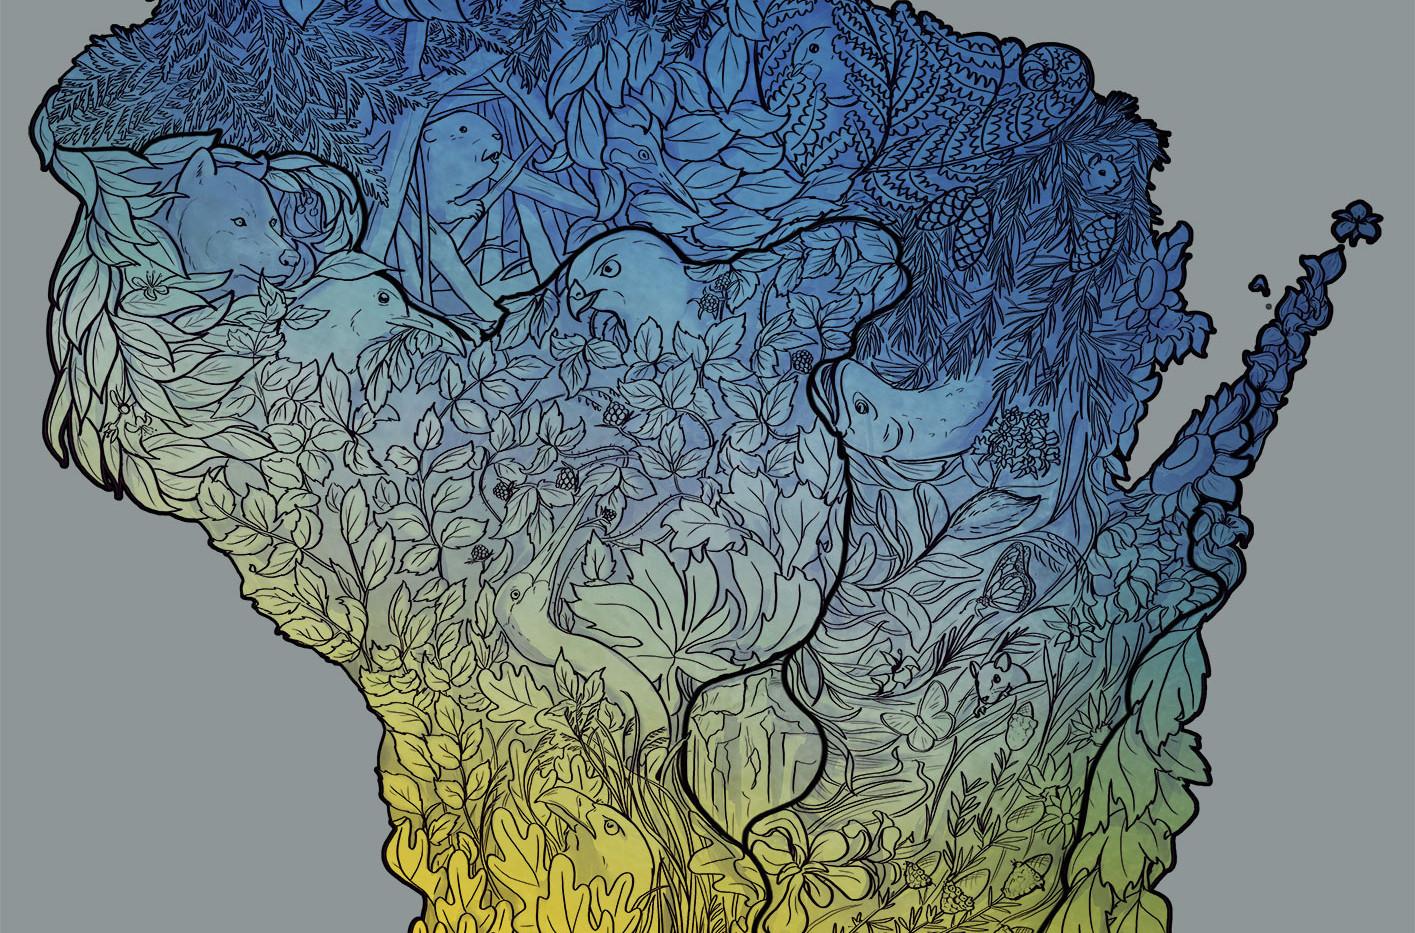 Ice Age Trail Alliance